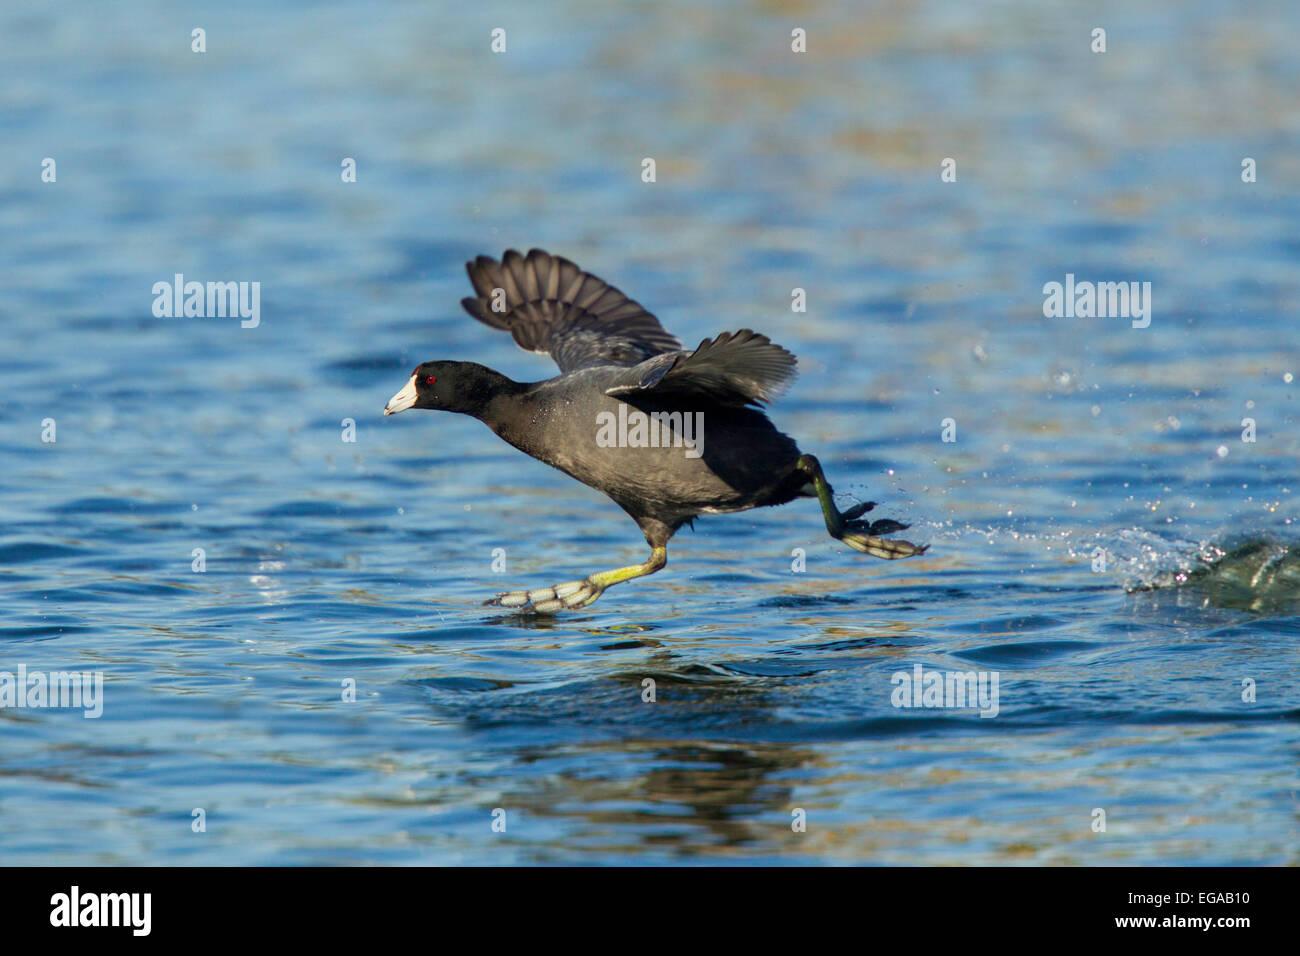 American Coot  Fulica americana Tucson, Arizona, United States 13 February       Adult running to take flight.  - Stock Image